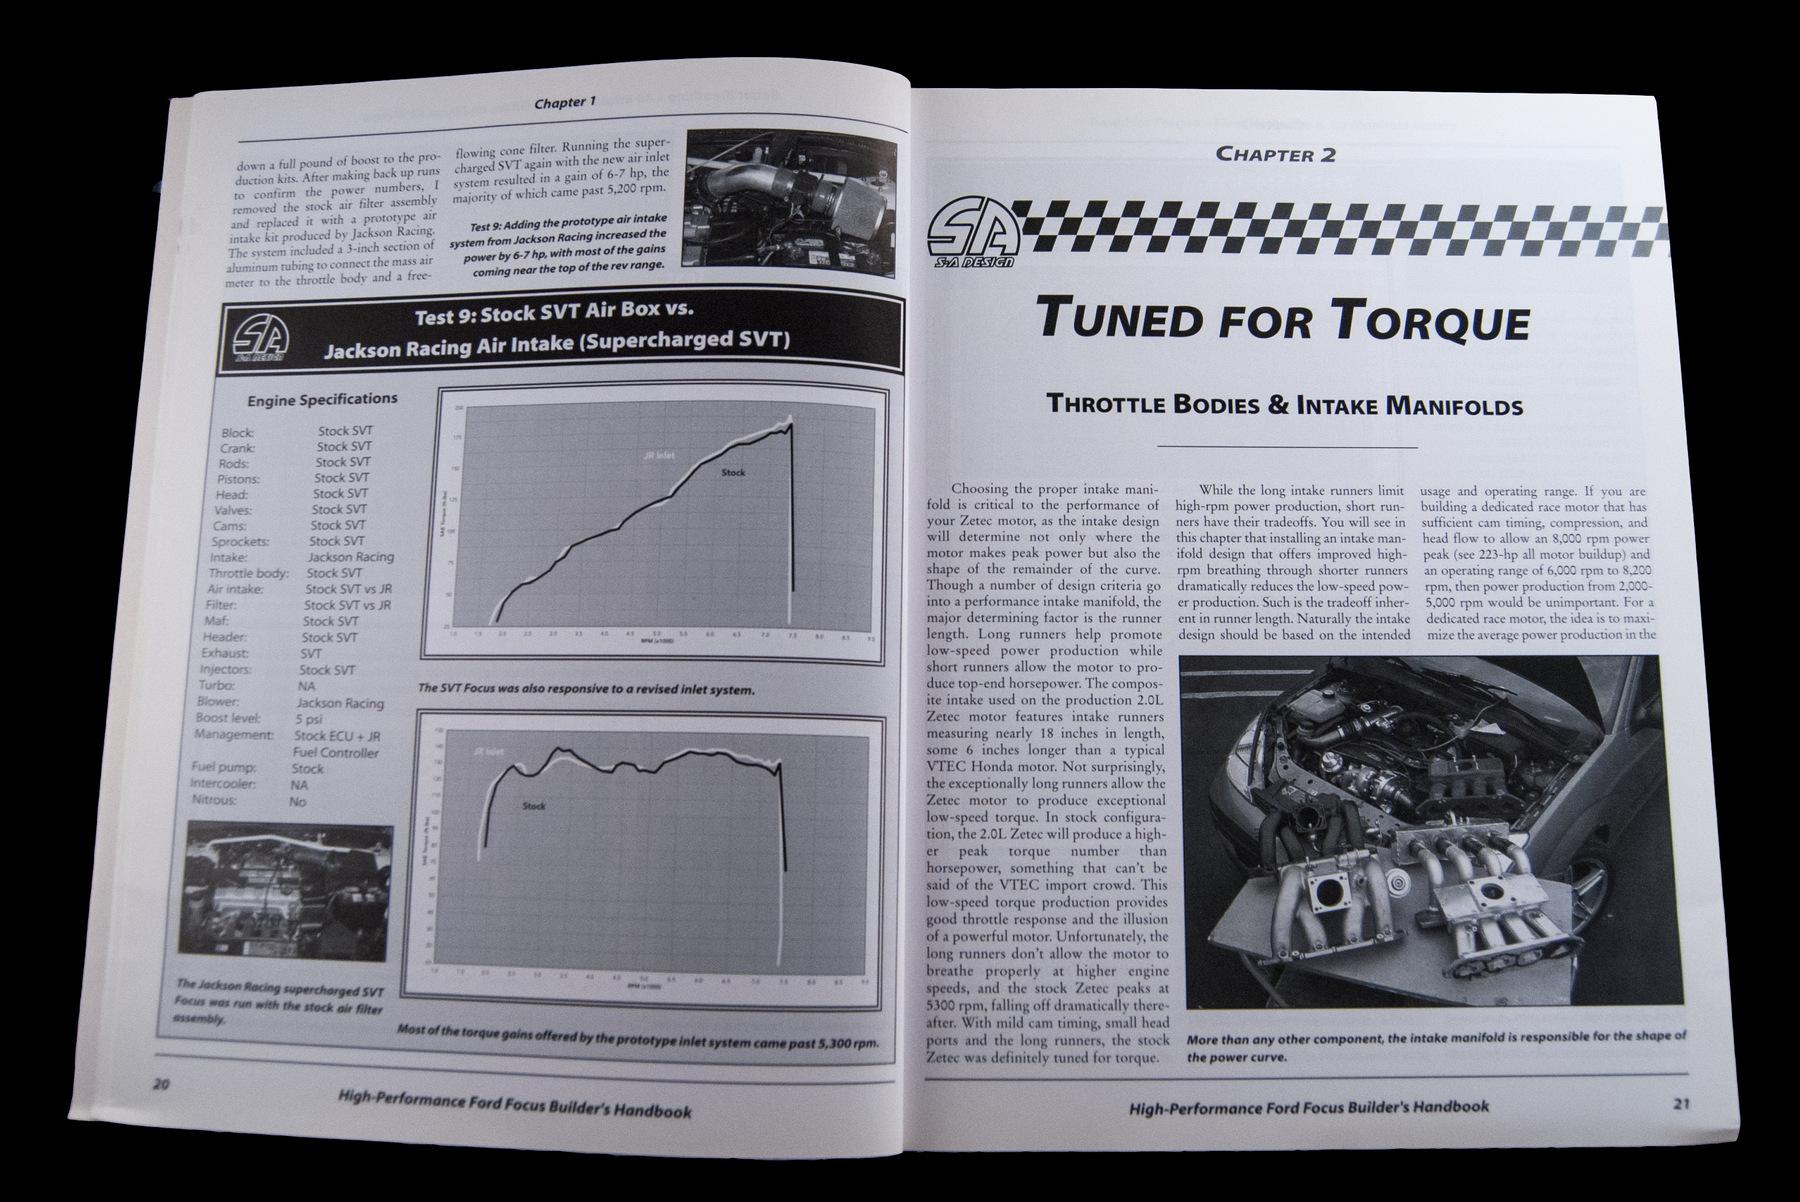 High-Performance Ford Focus Builder's Handbook